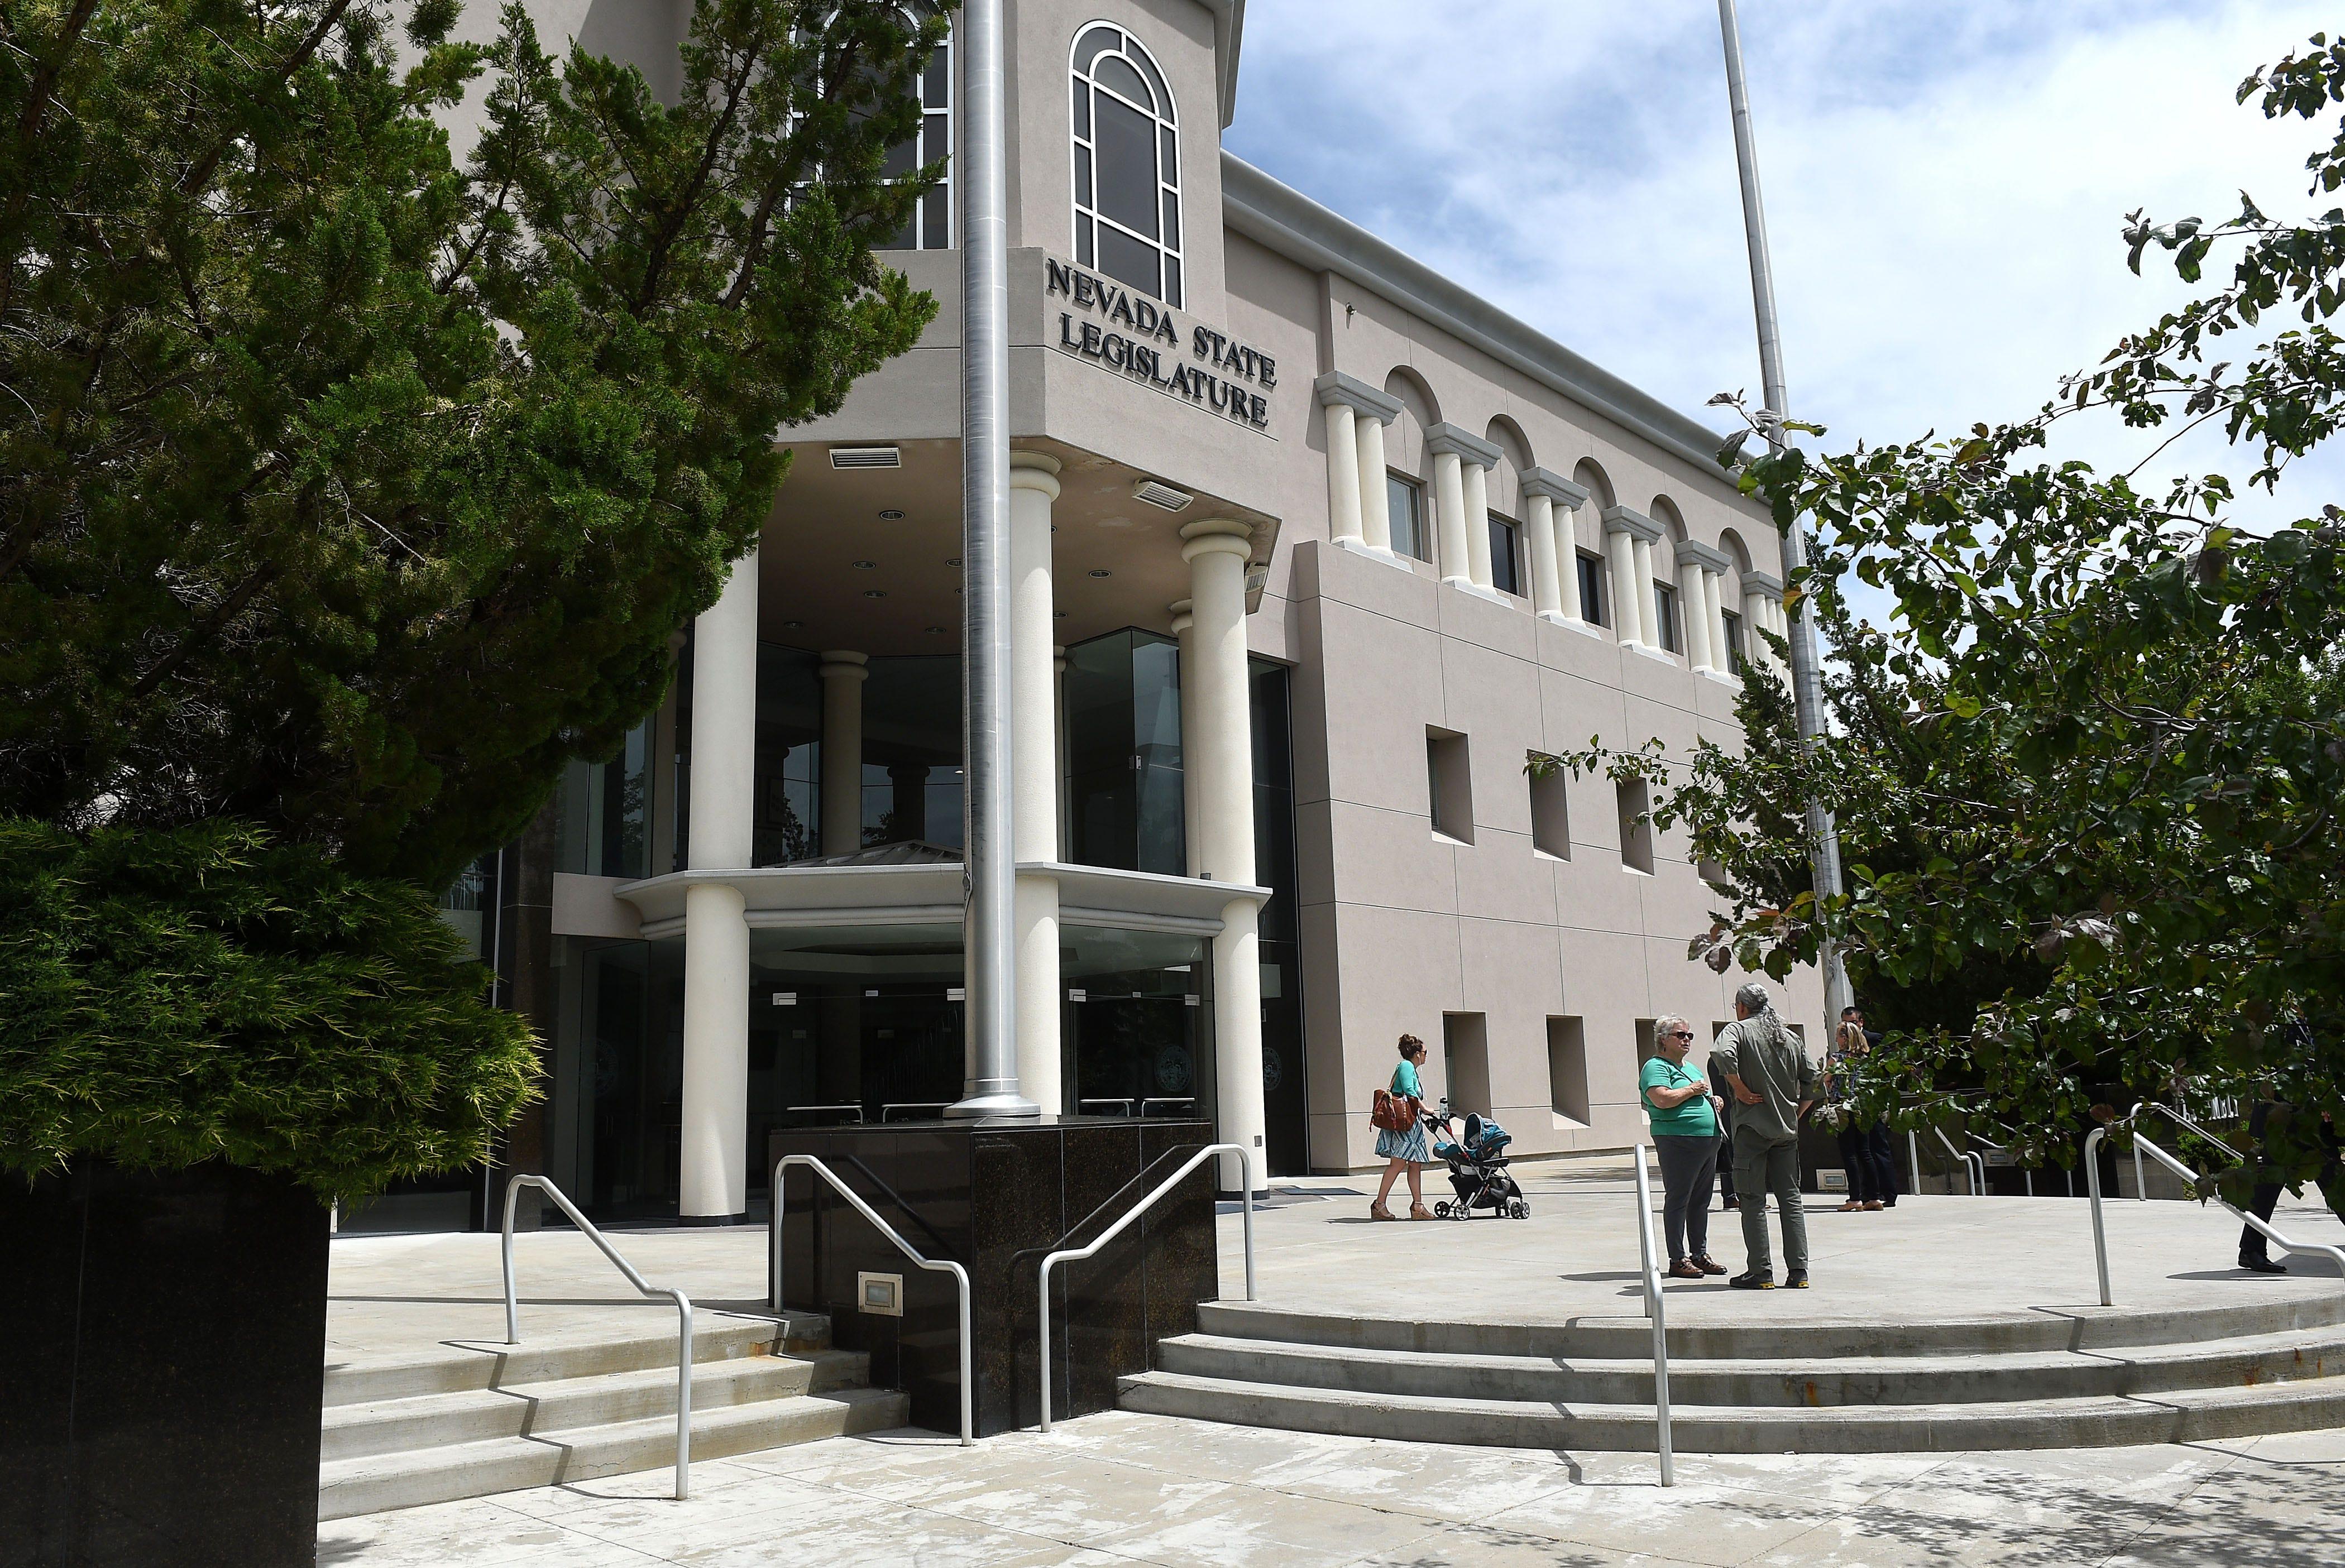 Nevada makes U.S. history with first-ever female-majority state Legislature